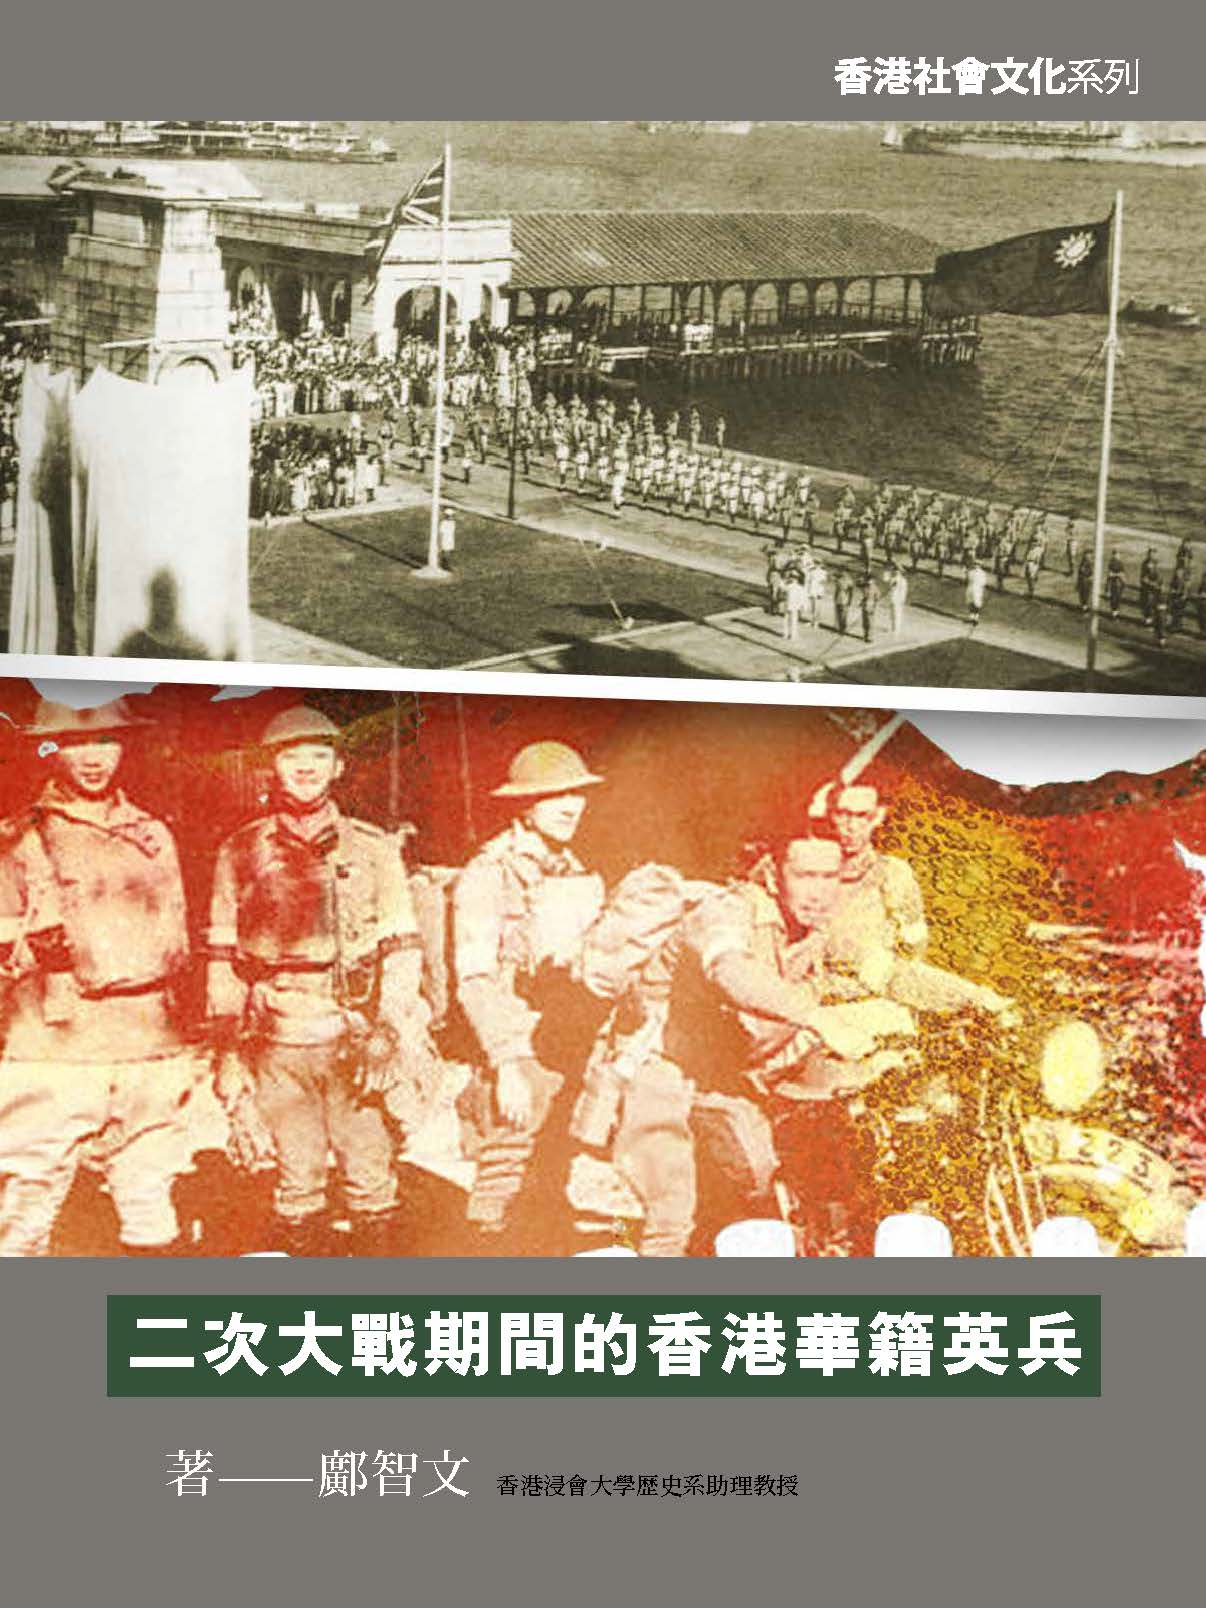 HKSCS-018-kcm